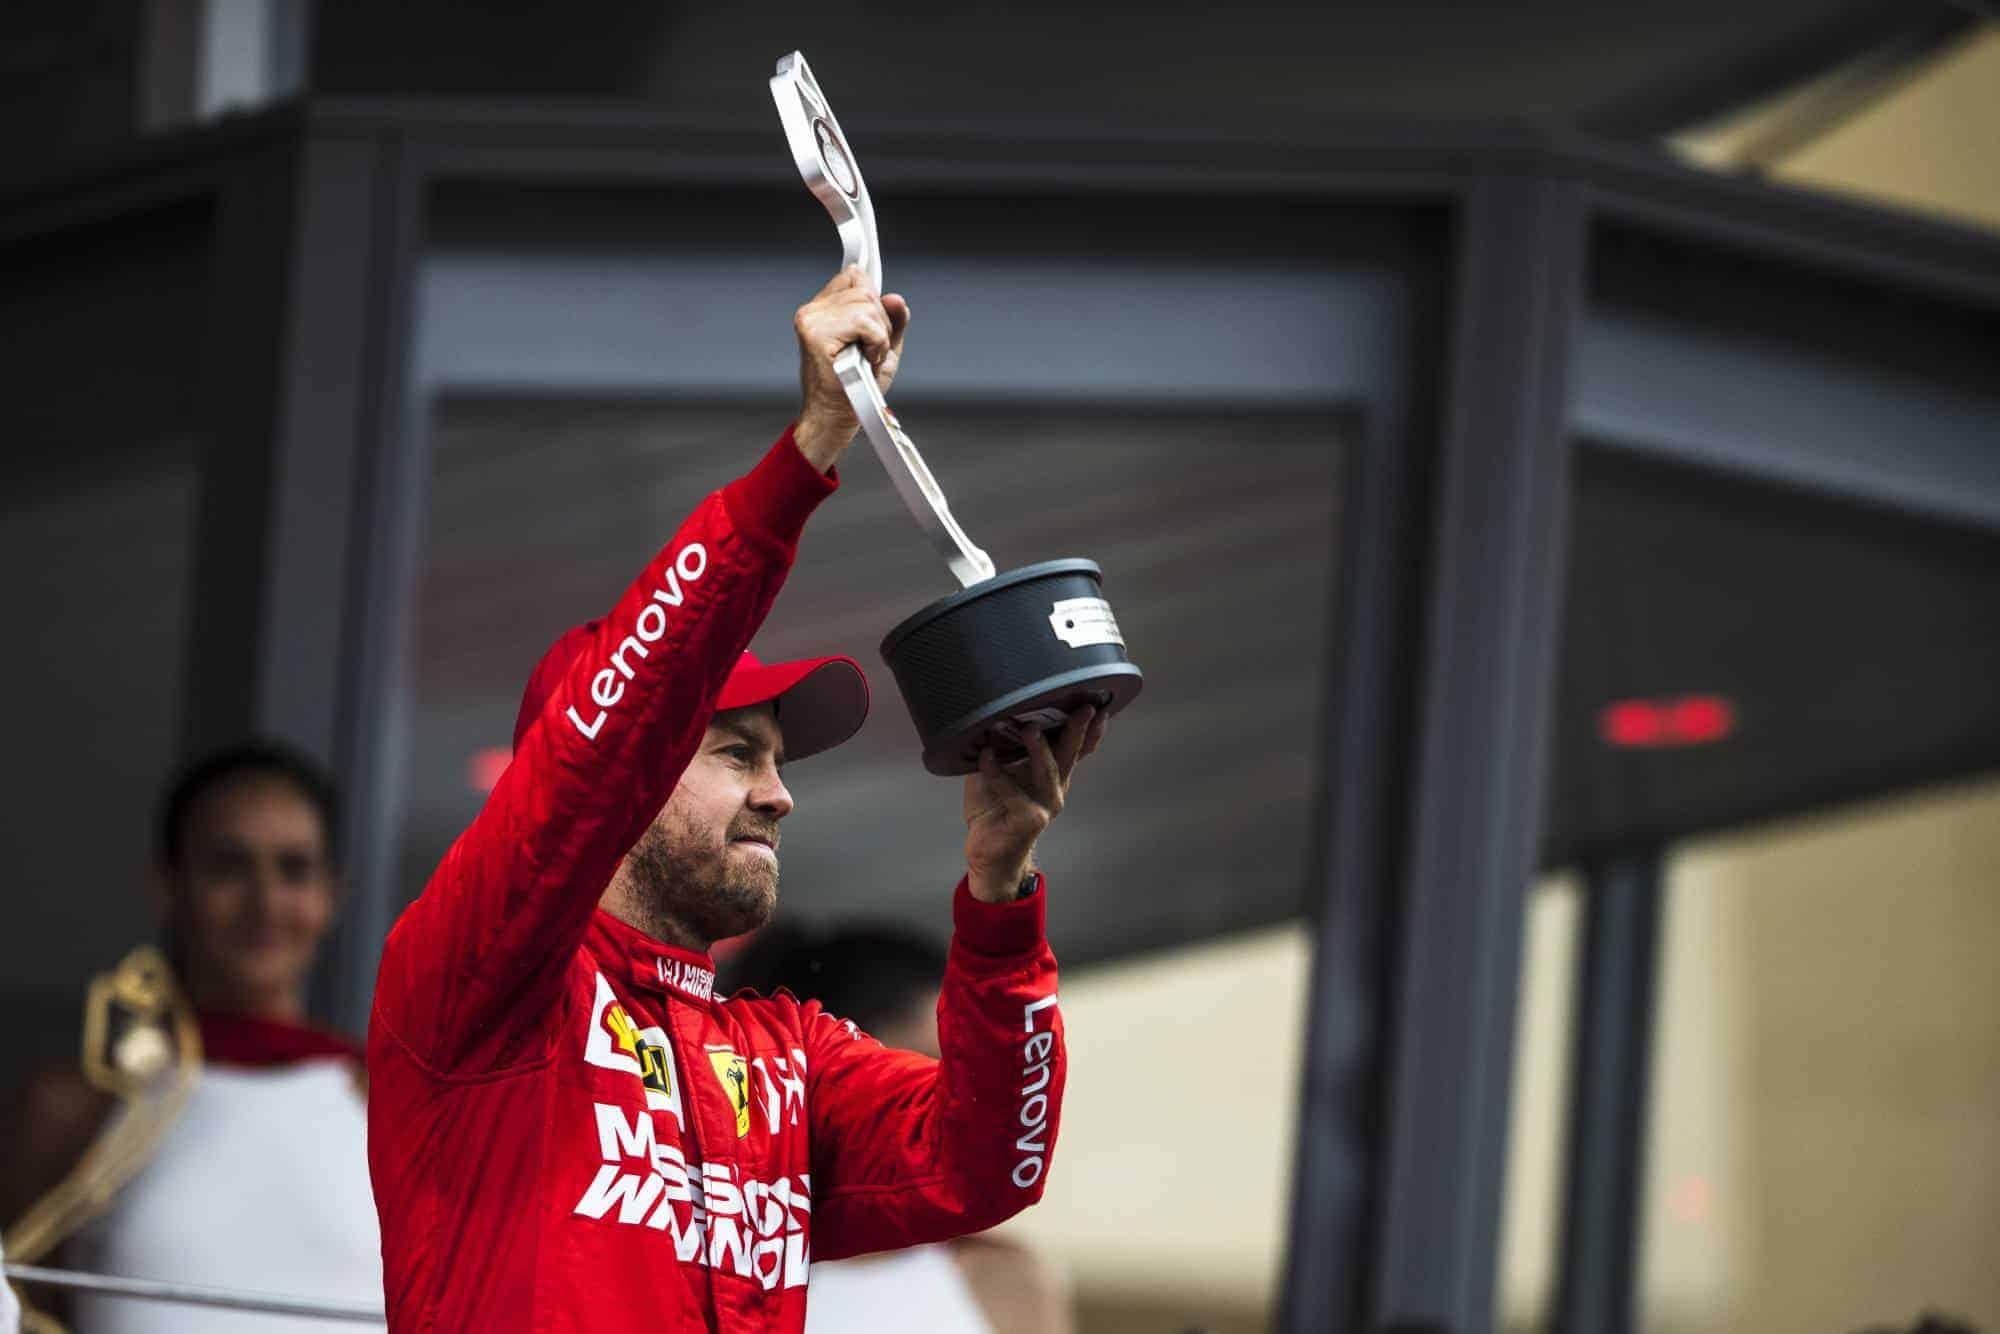 Vettel Ferrari Monaco GP F1 2019 podium trophy Photo Ferrari